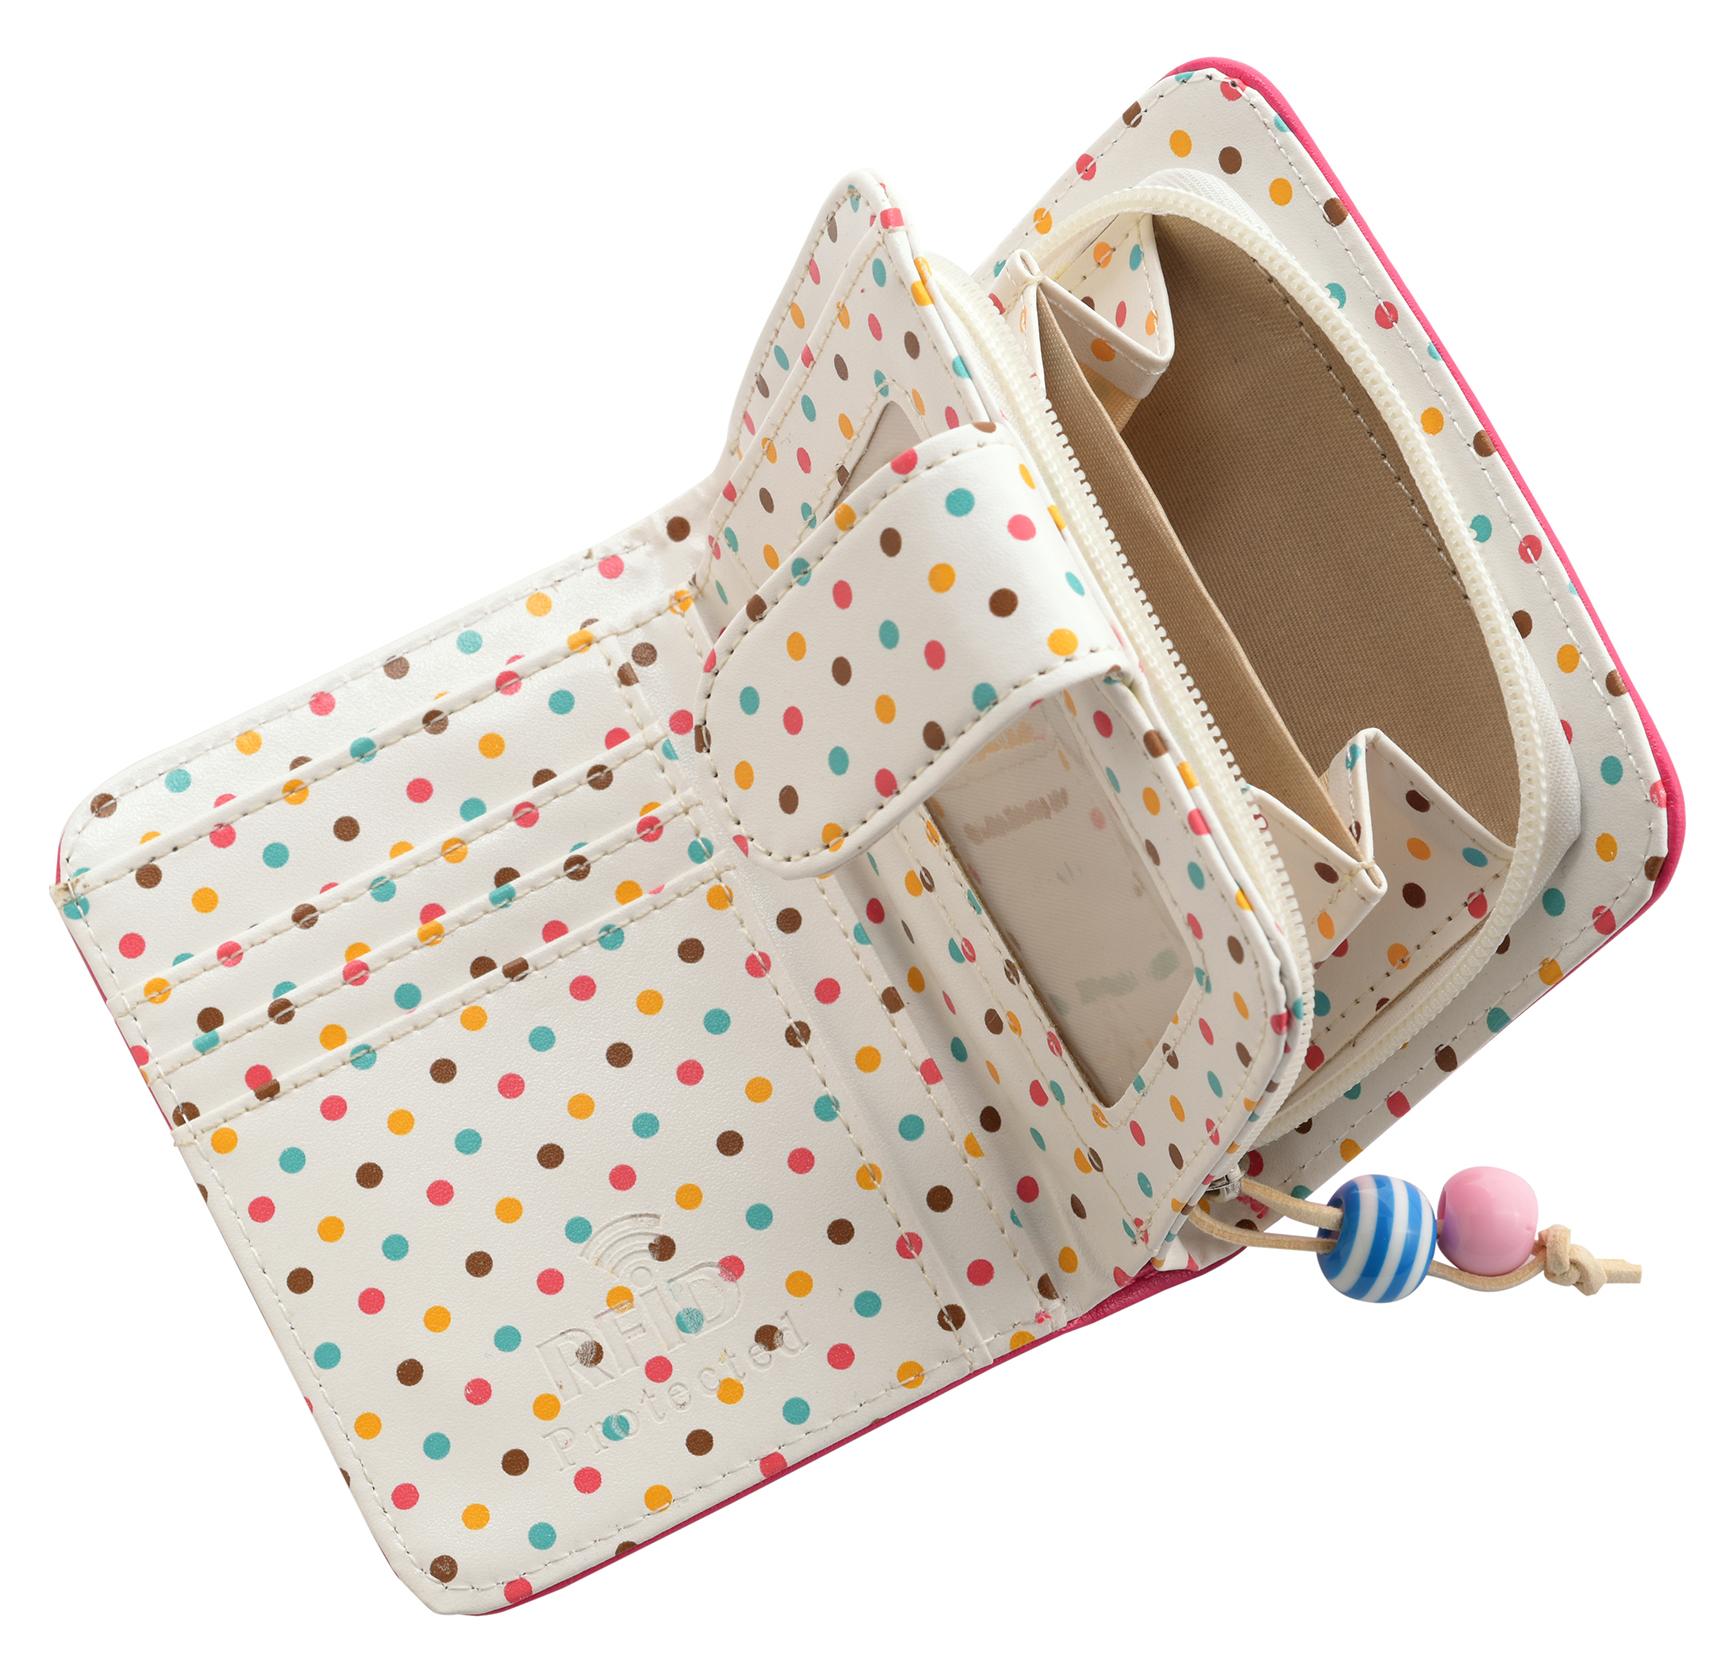 Mesdames-RFID-Bloquant-Petites-En-Faux-Cuir-Polka-Dot-Sac-zippee miniature 6